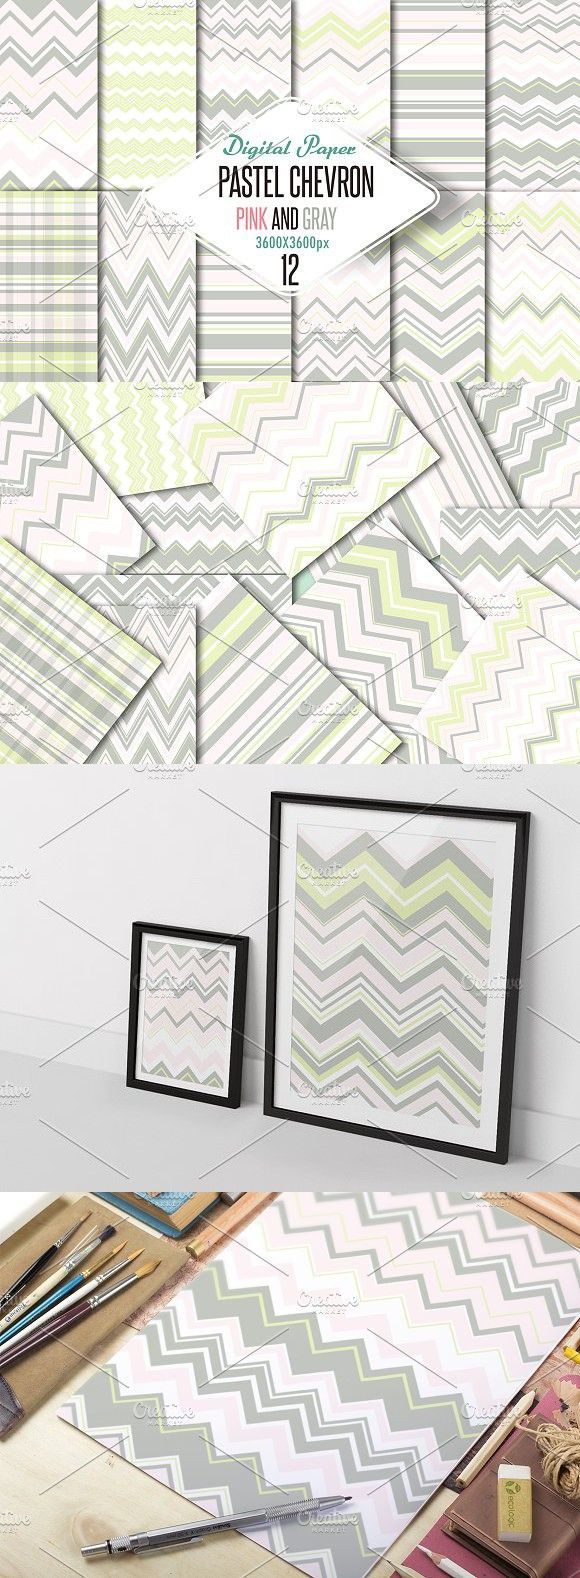 Pastel chevron pink-gray paper. Patterns